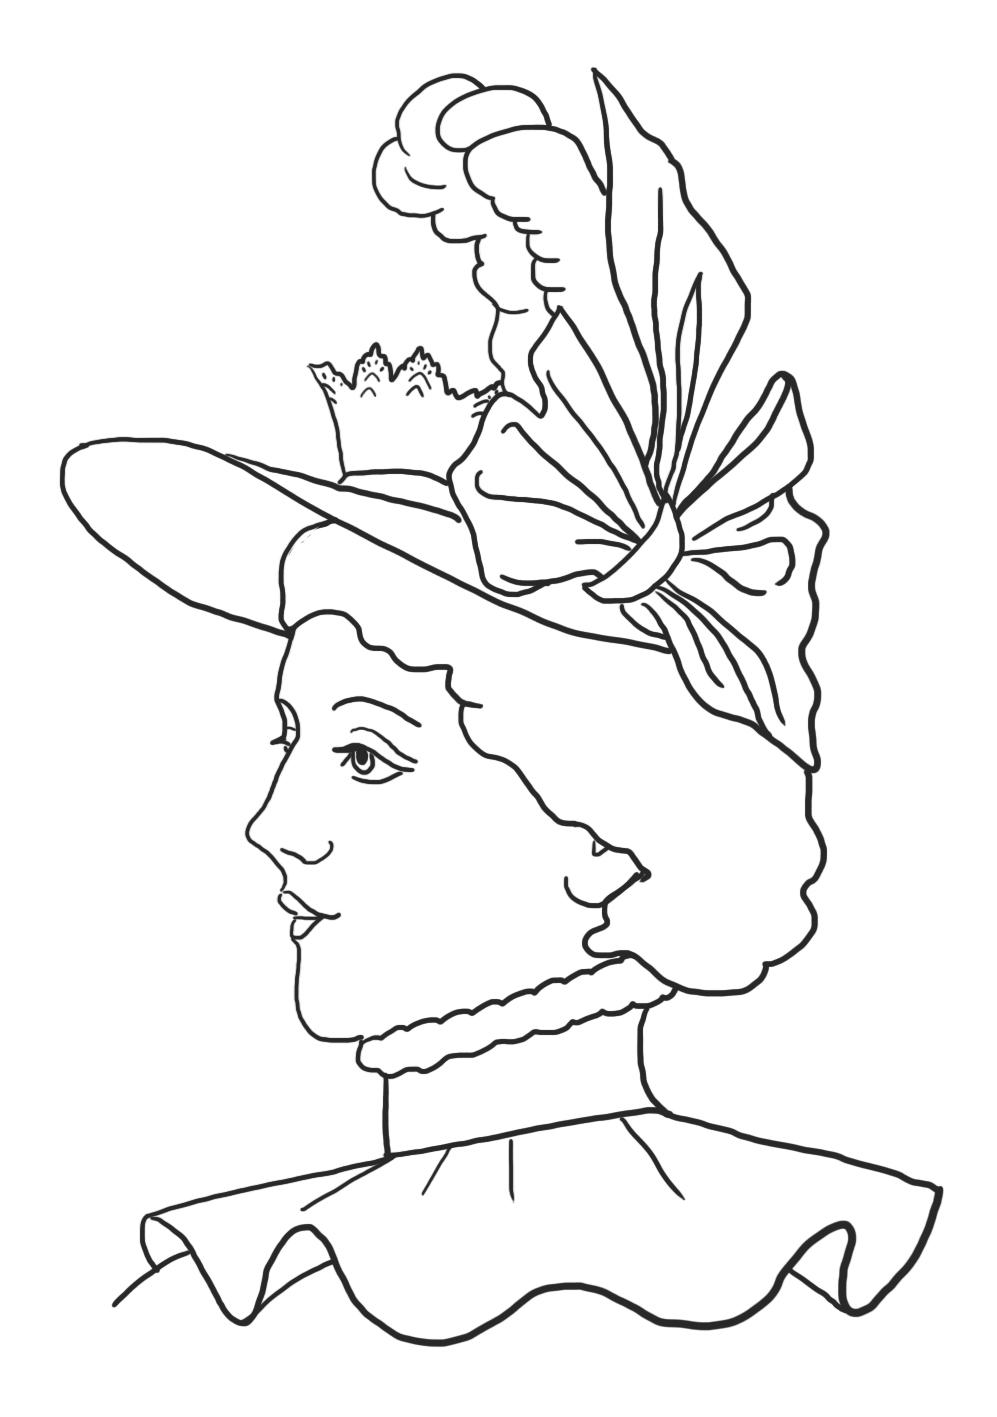 Coloring page tiara hat Victorian era